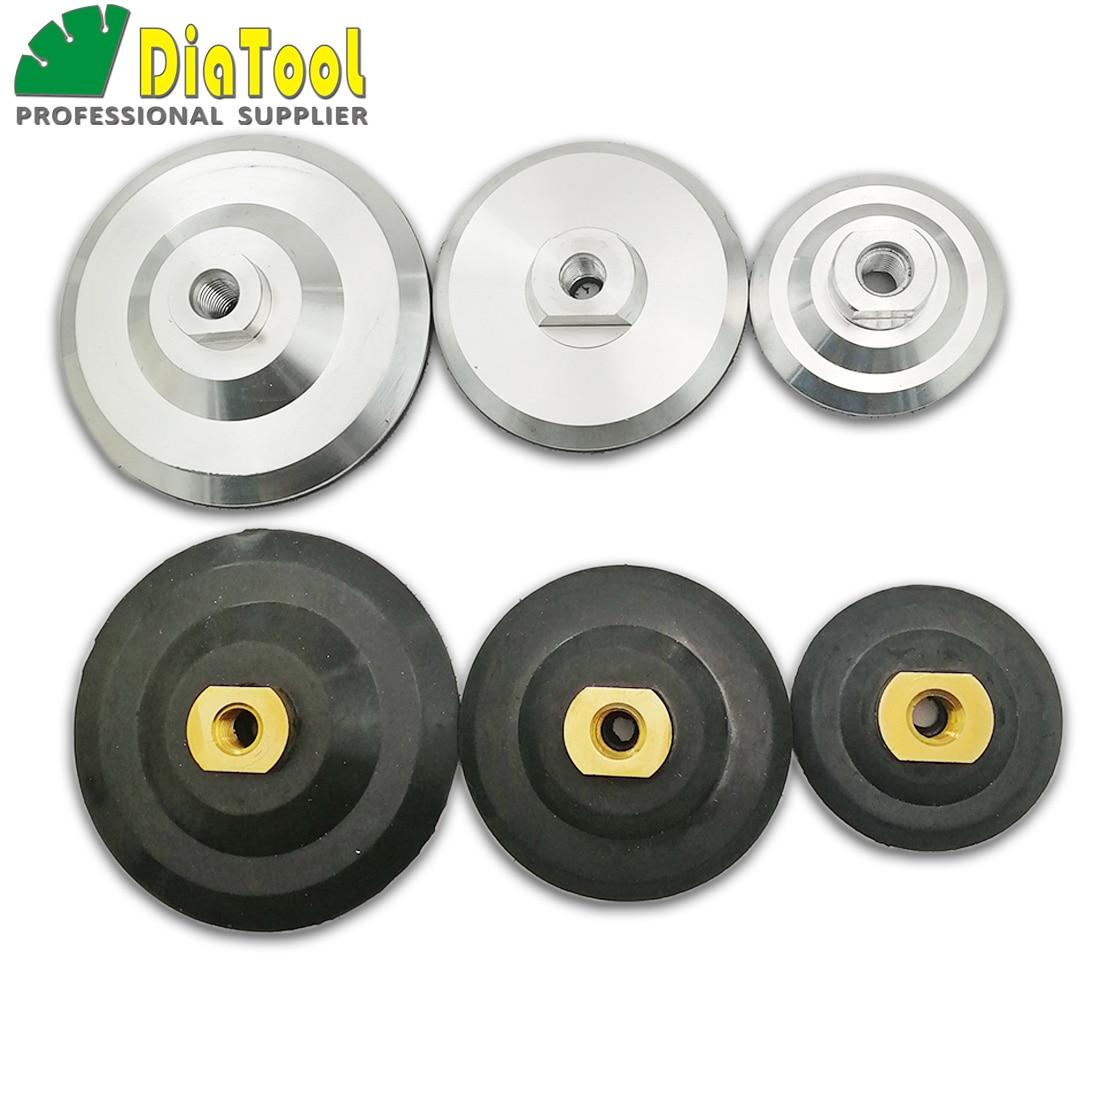 DIATOOL Back Pad For Diamond Polishing Pads M14 Thread Diameter 3